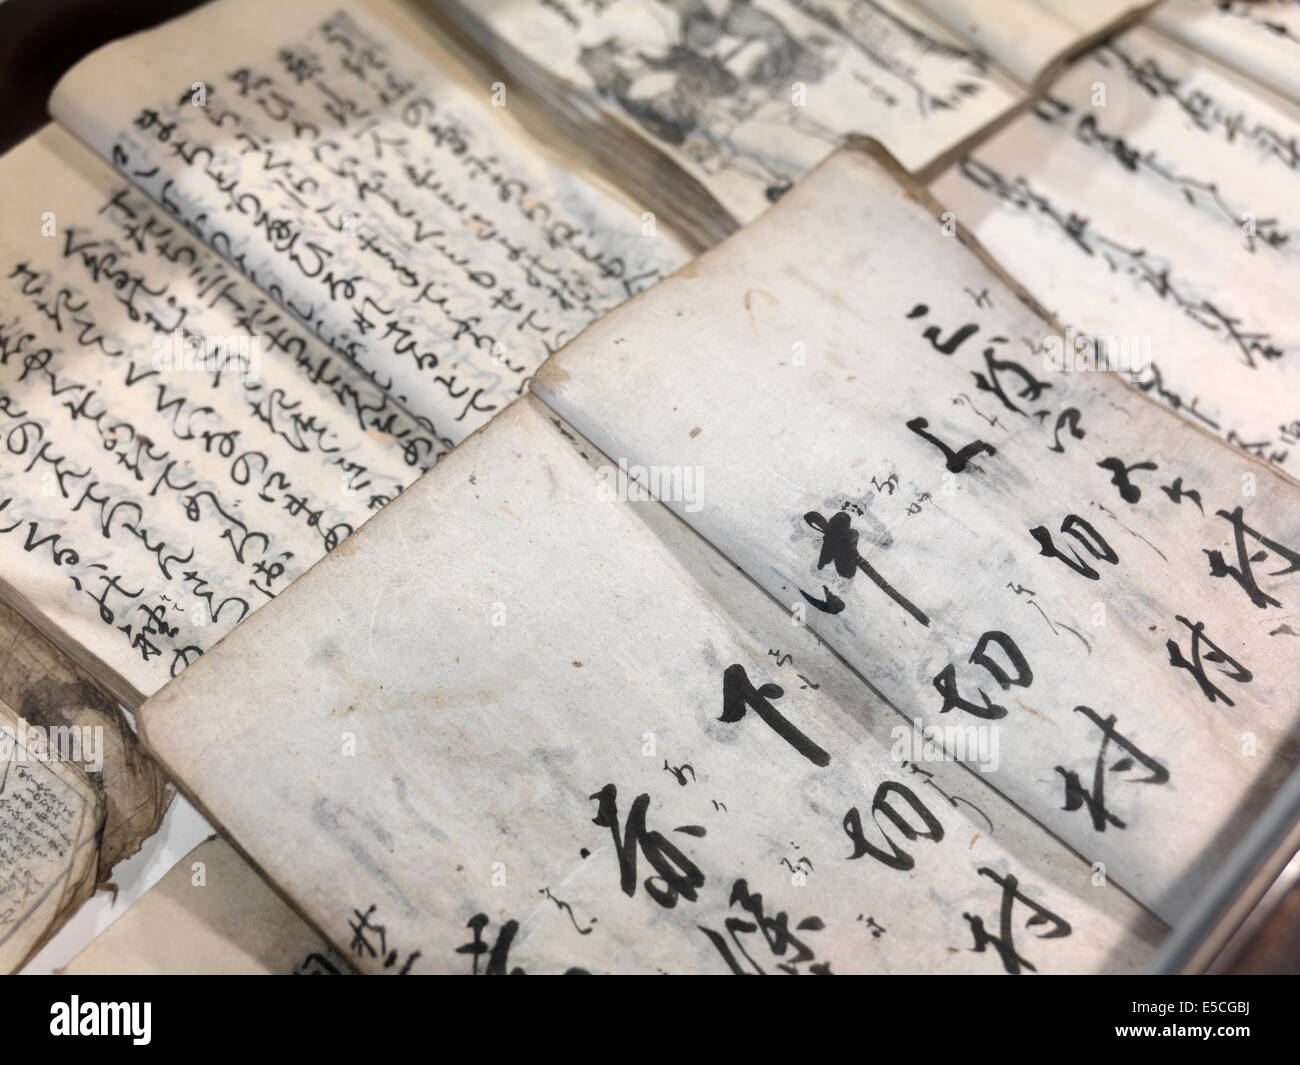 Historic Kana Hiragana Japanese writings on rice paper at a museum. Gero Onsen Gassho Village, Gifu Prefecture, - Stock Image